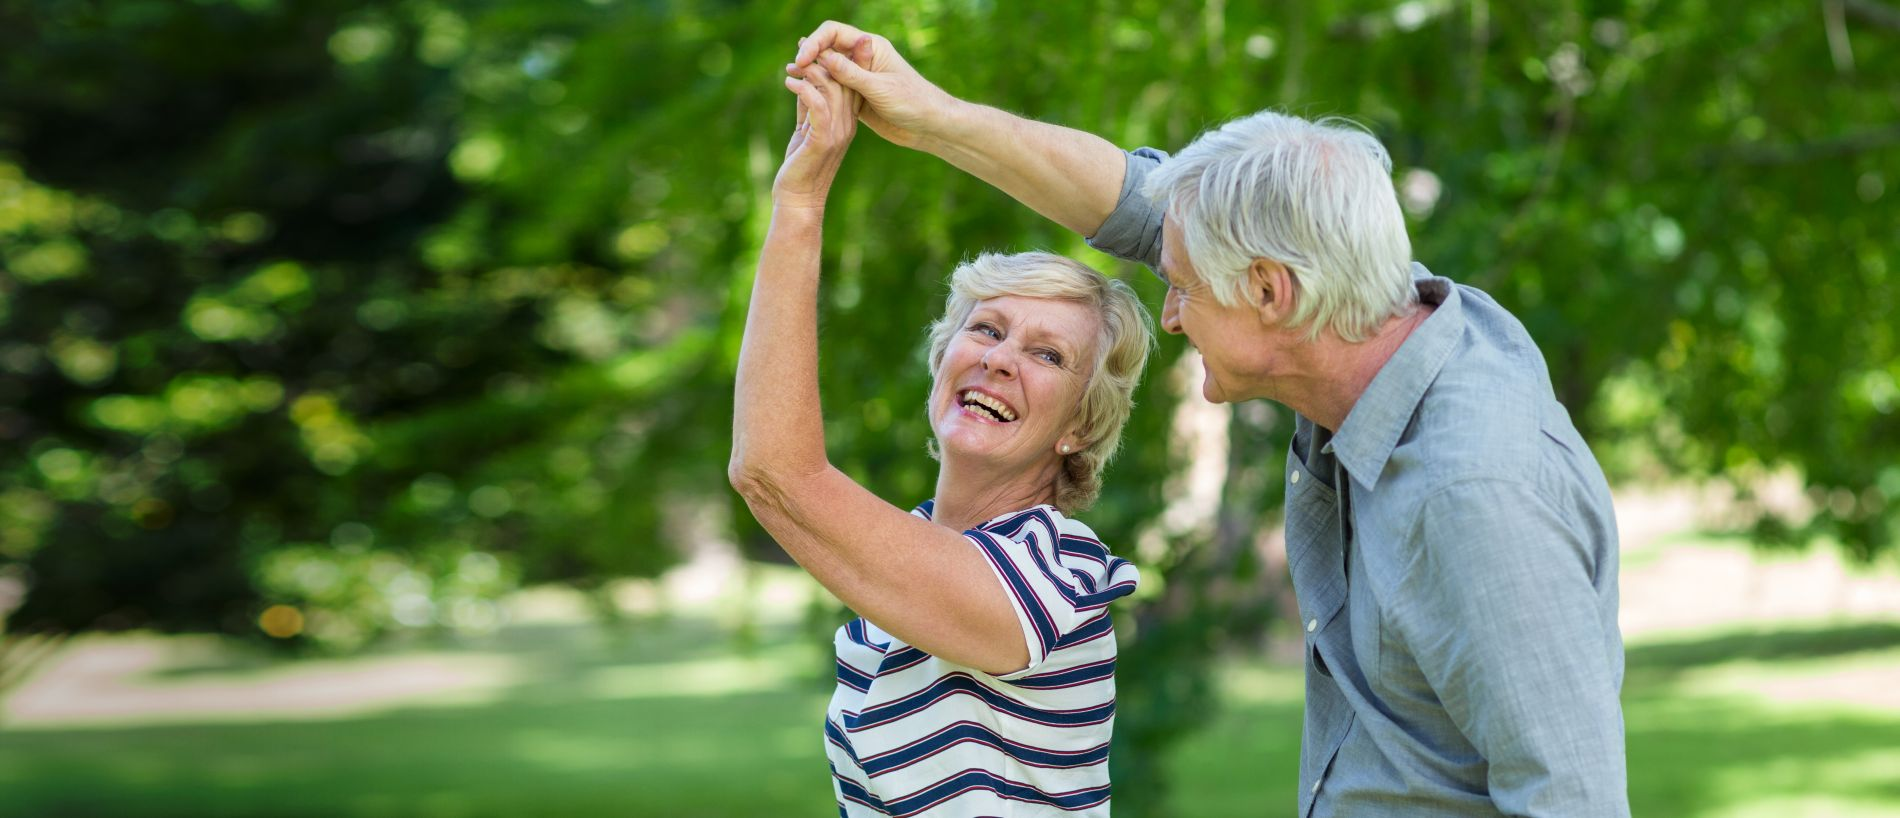 Кредит пенсионерам на отдых